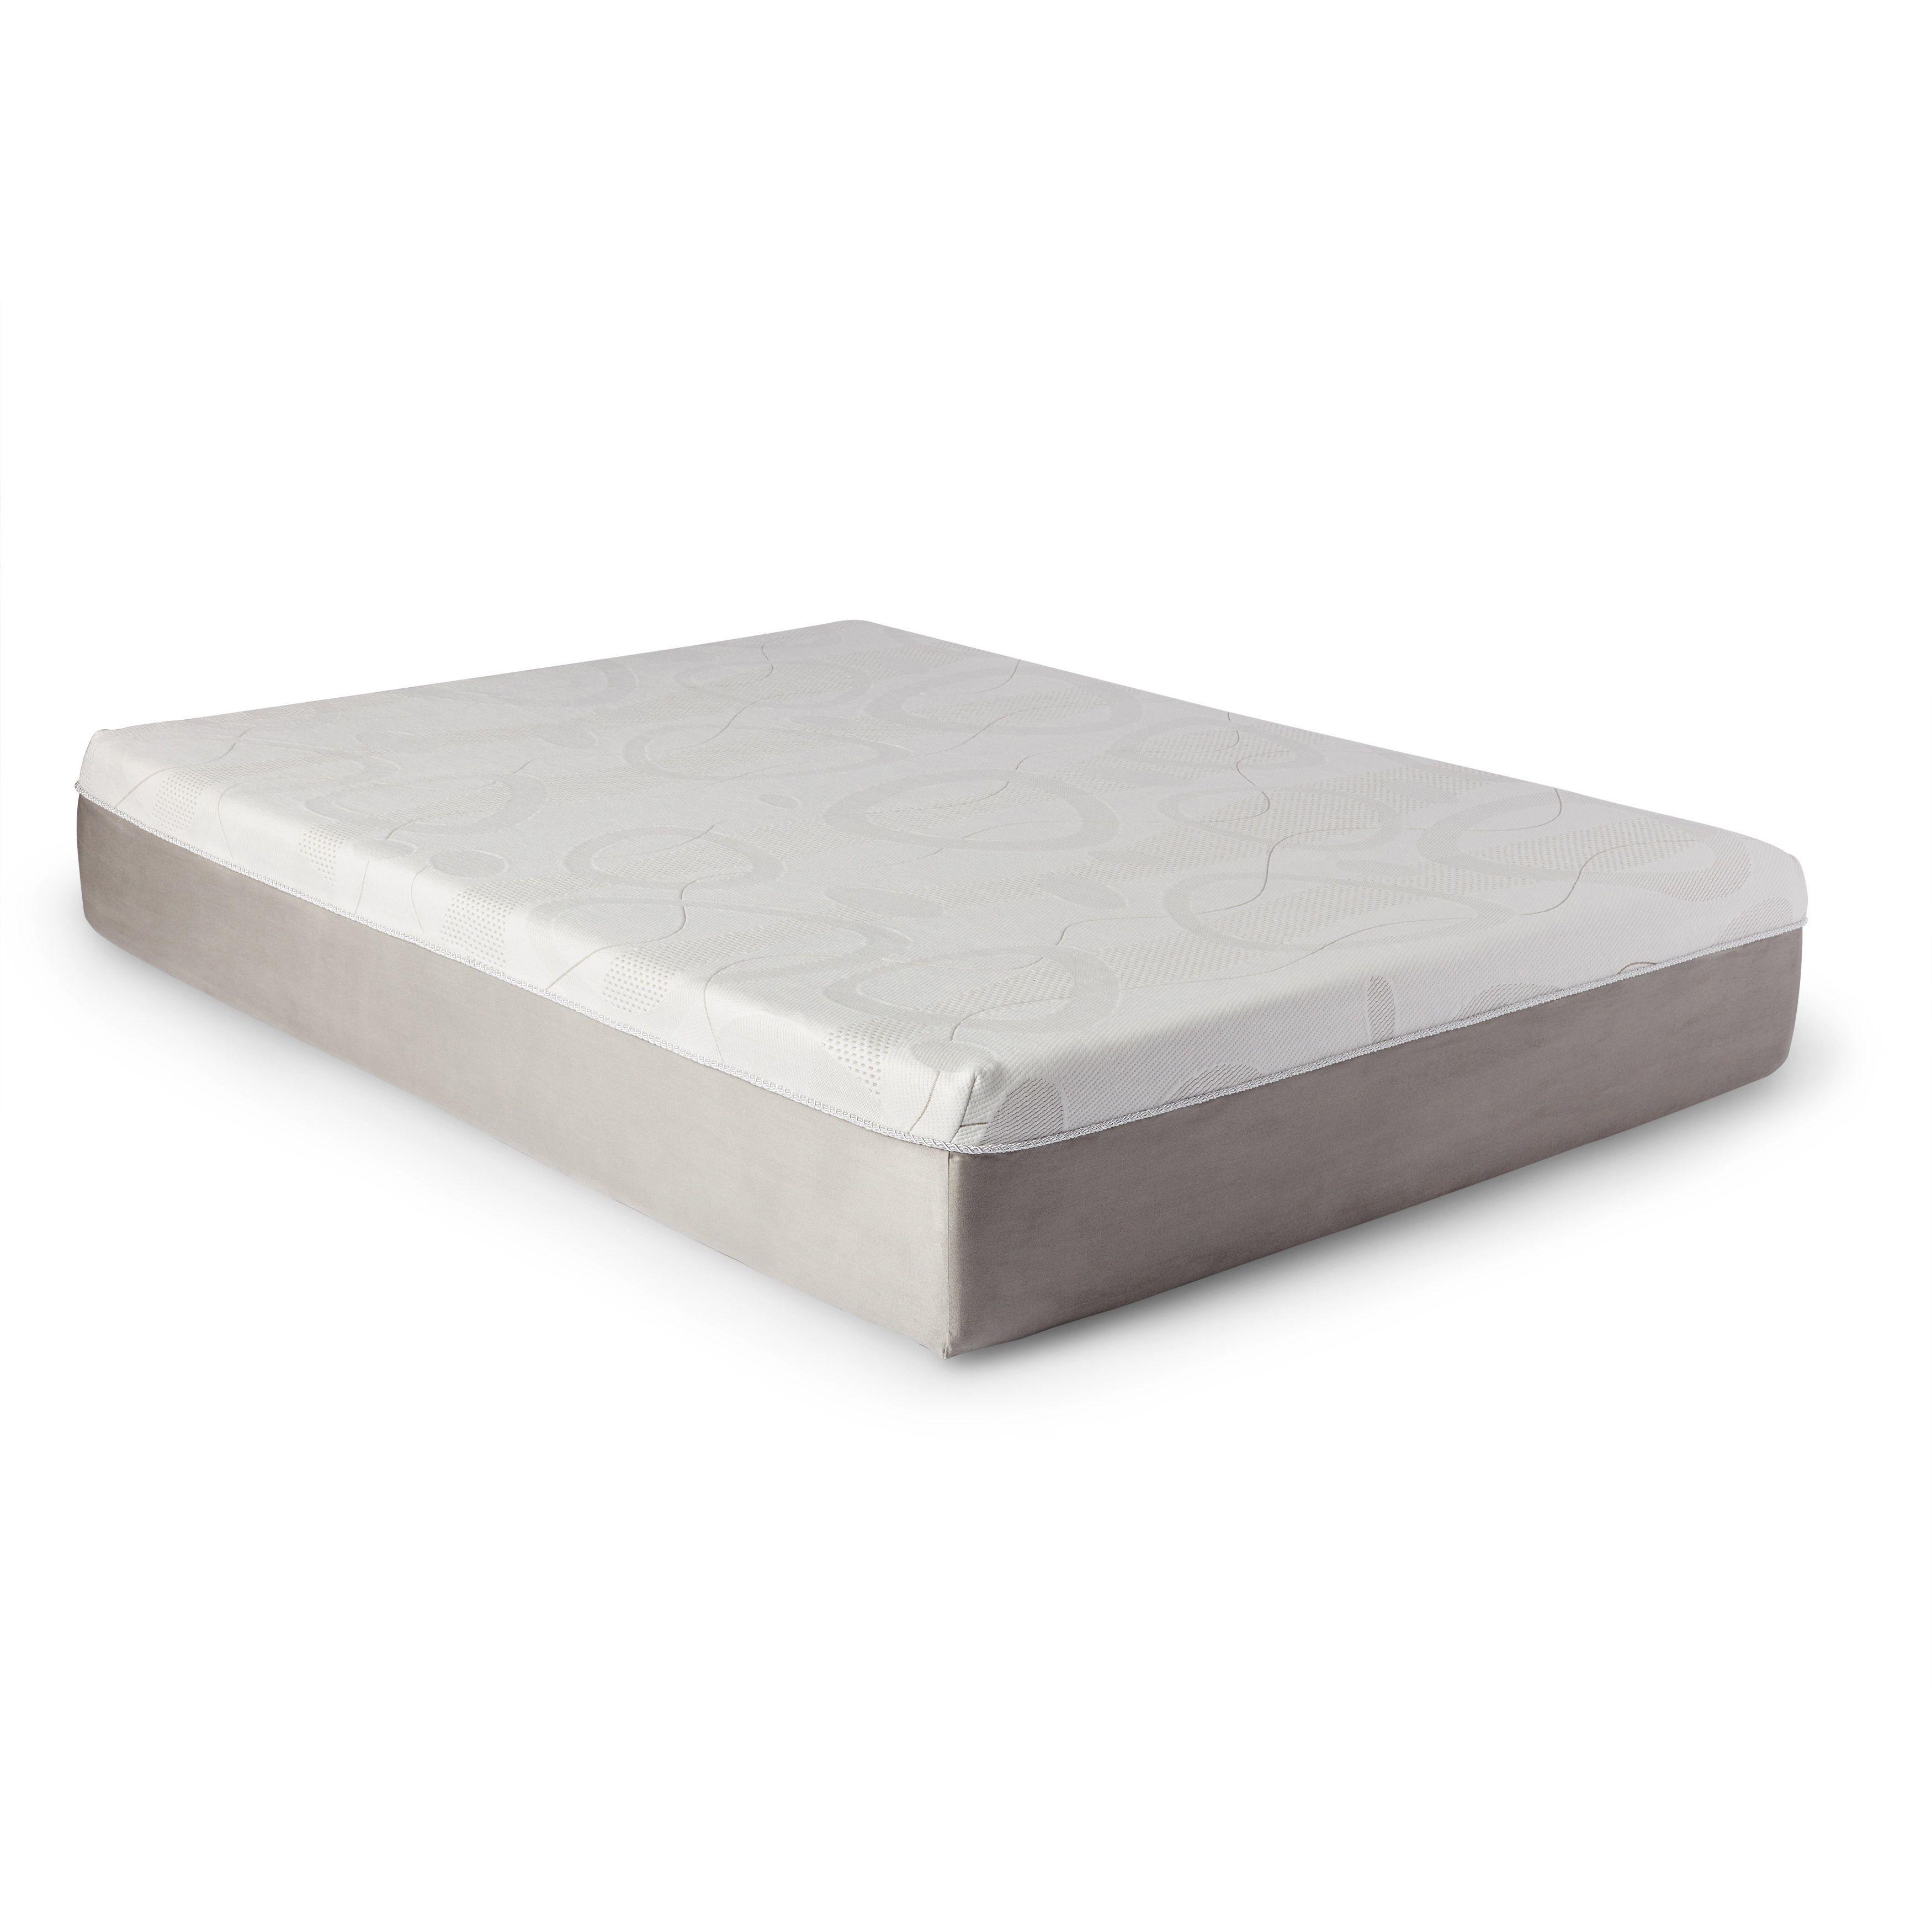 Slumber Solutions Choose Your Comfort 12 Inch Gel Memory Foam